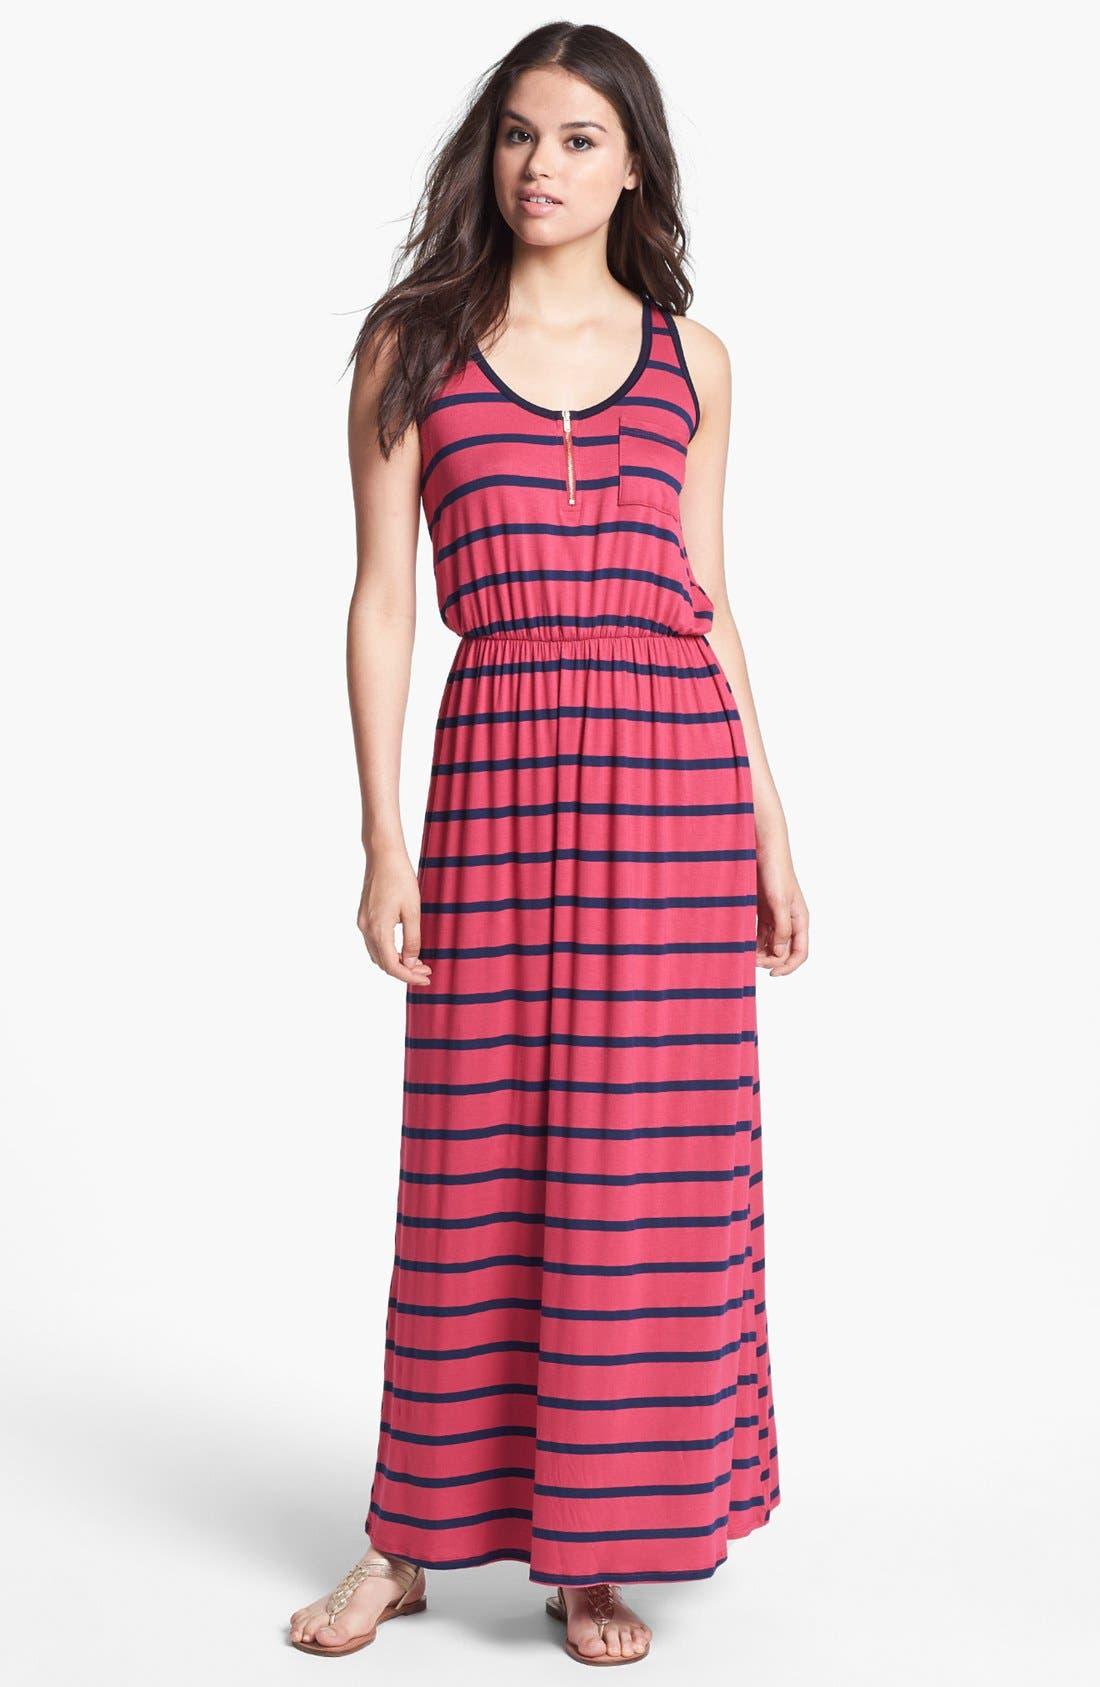 Alternate Image 1 Selected - Everleigh Zip Front Stripe Maxi Dress (Petite)